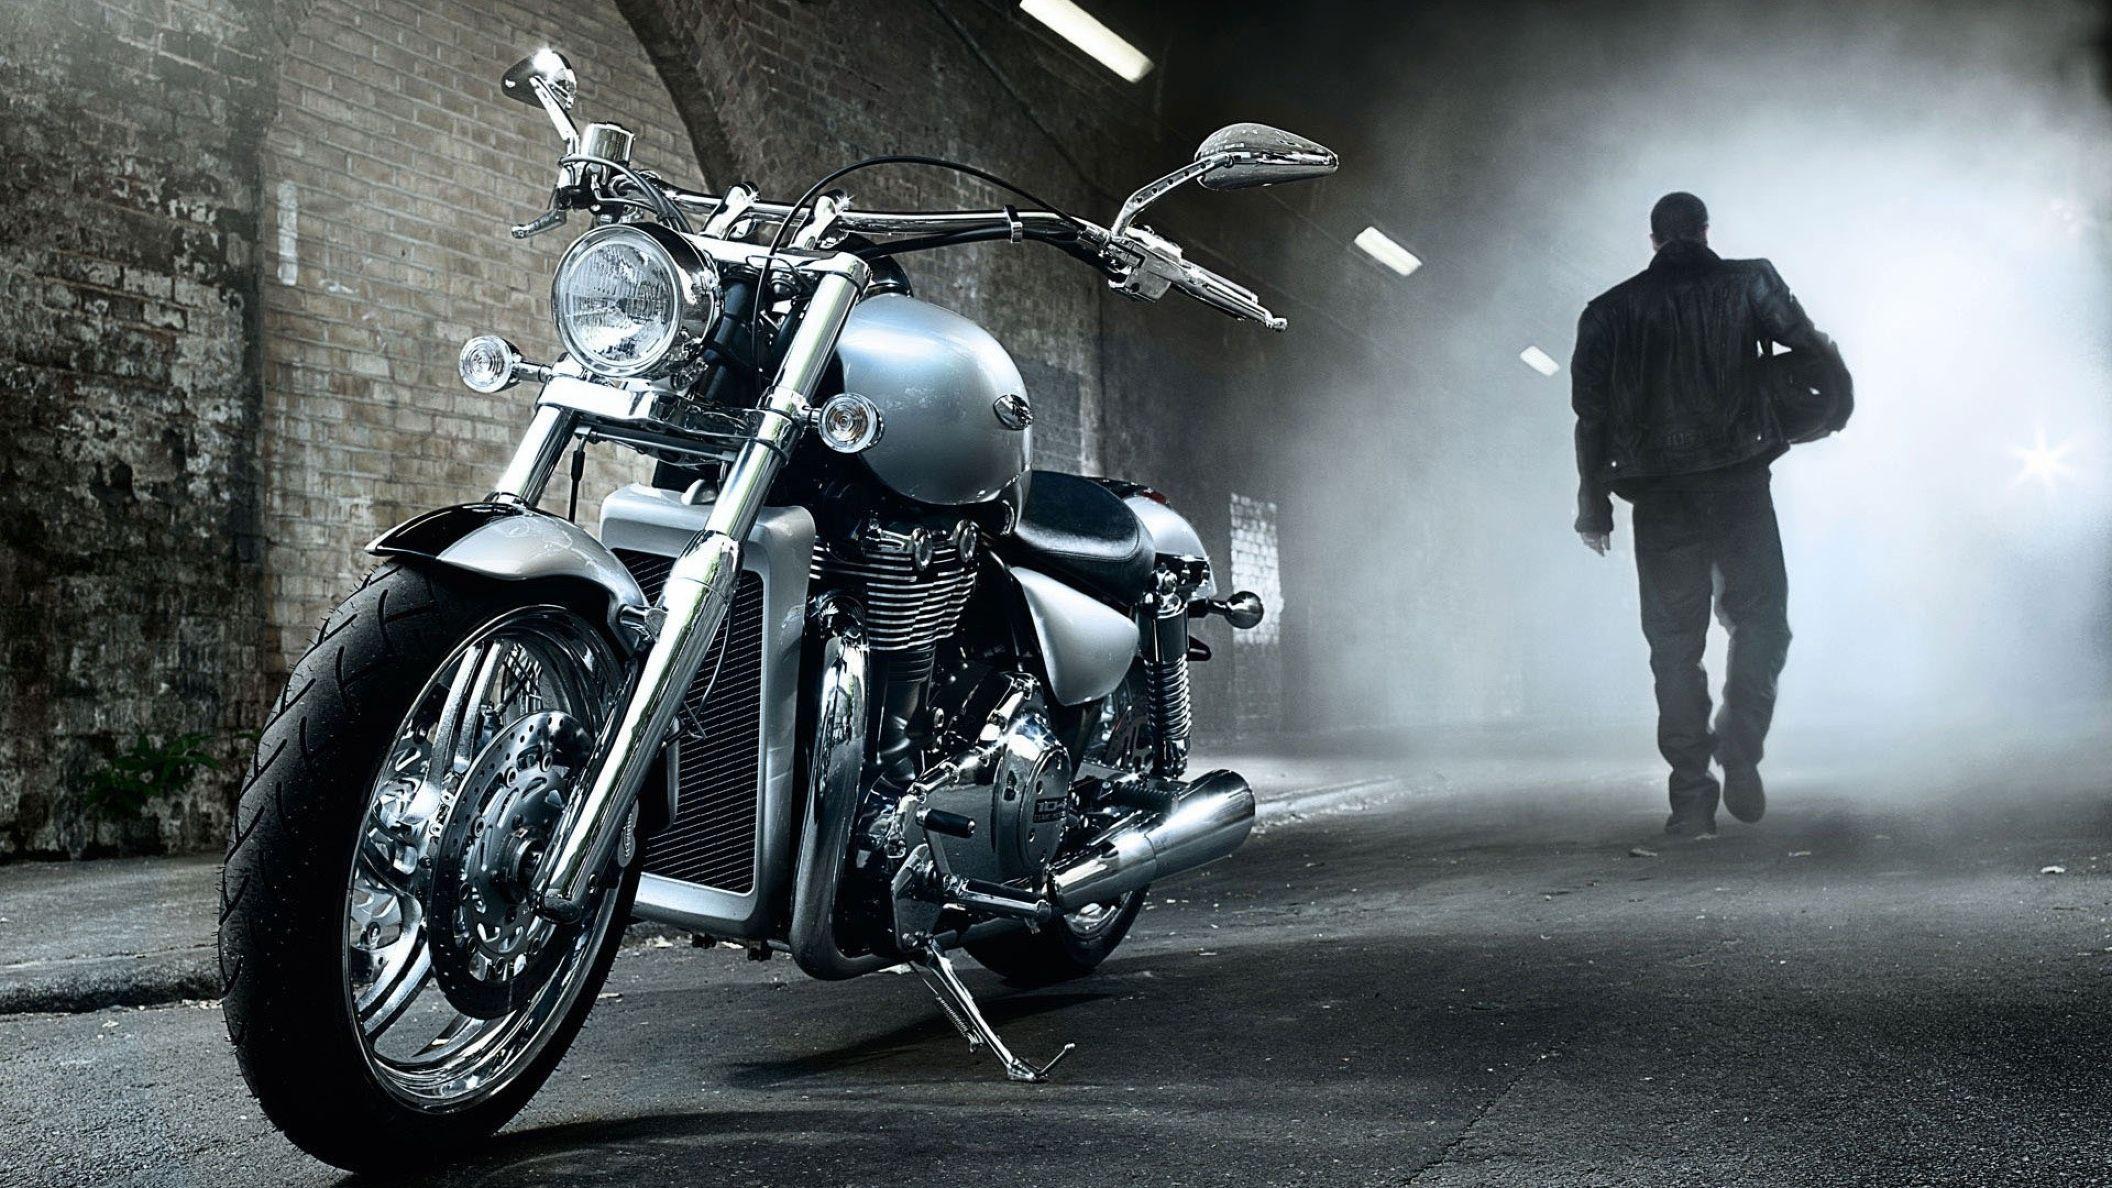 Hd Motorcycle Wallpapers Top Free Hd Motorcycle